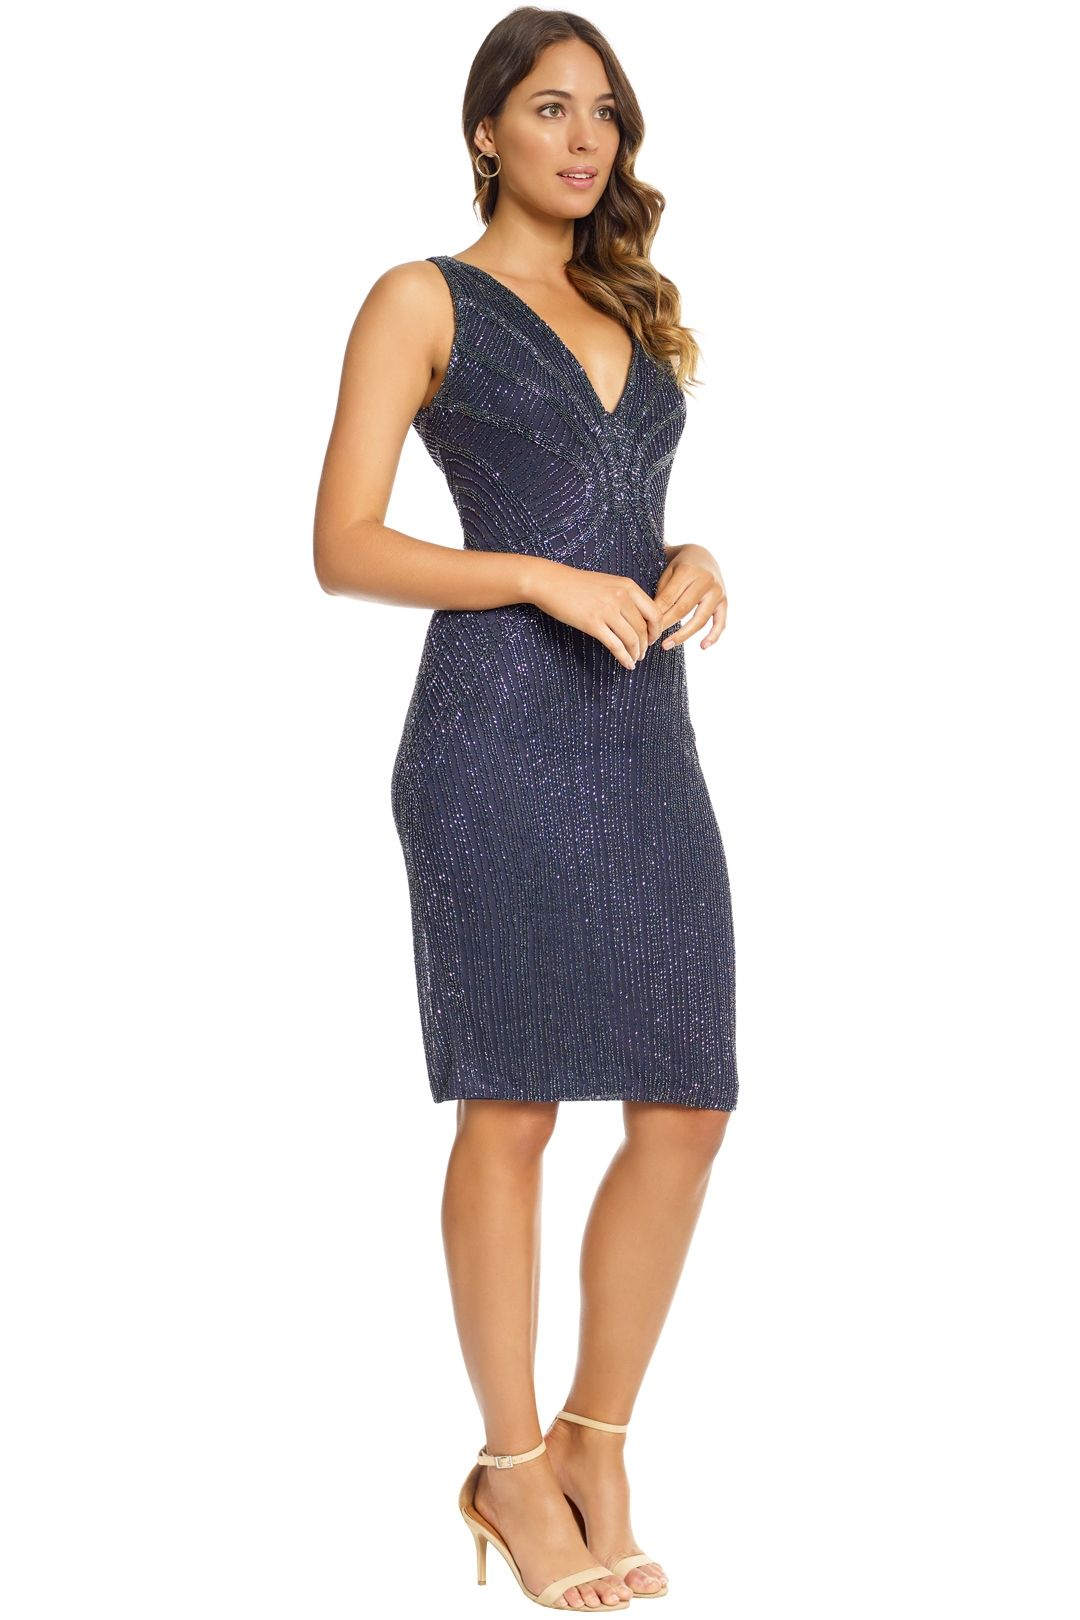 Rachel Gilbert - Layla Dress - Navy Sequin - Side